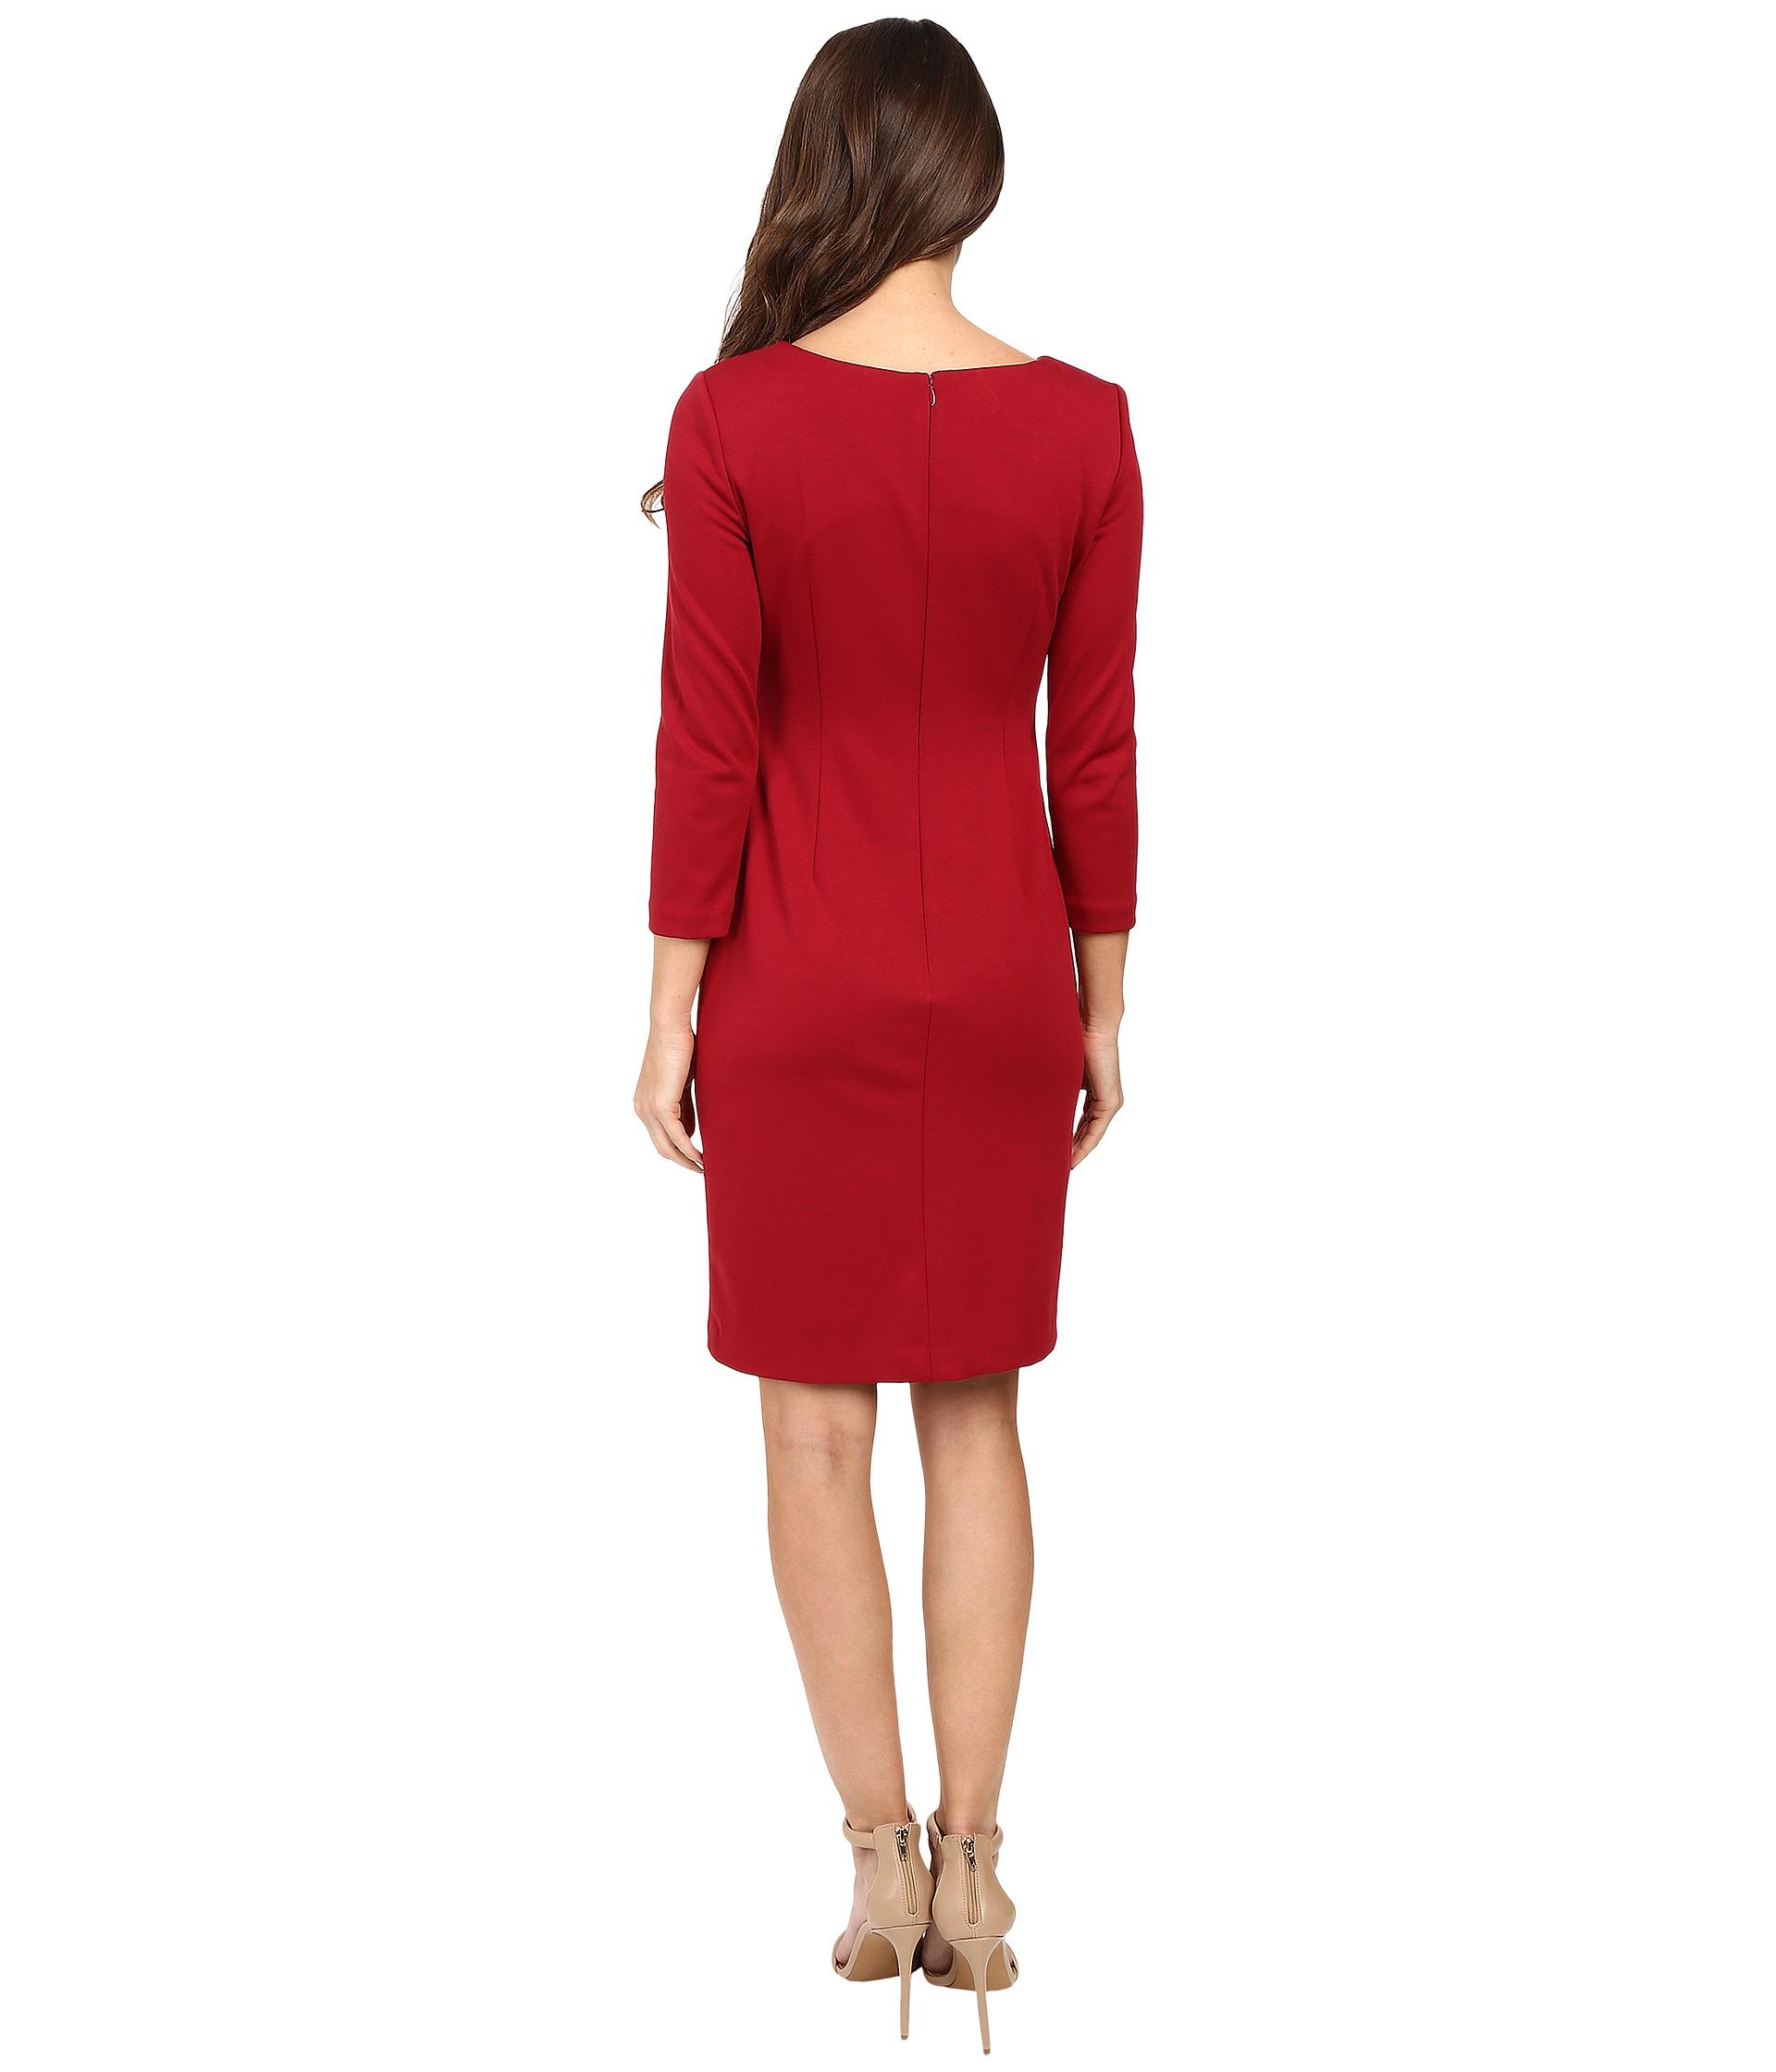 Lyst - Ivanka Trump Long Sleeve Ponte Dress With Side Zipper